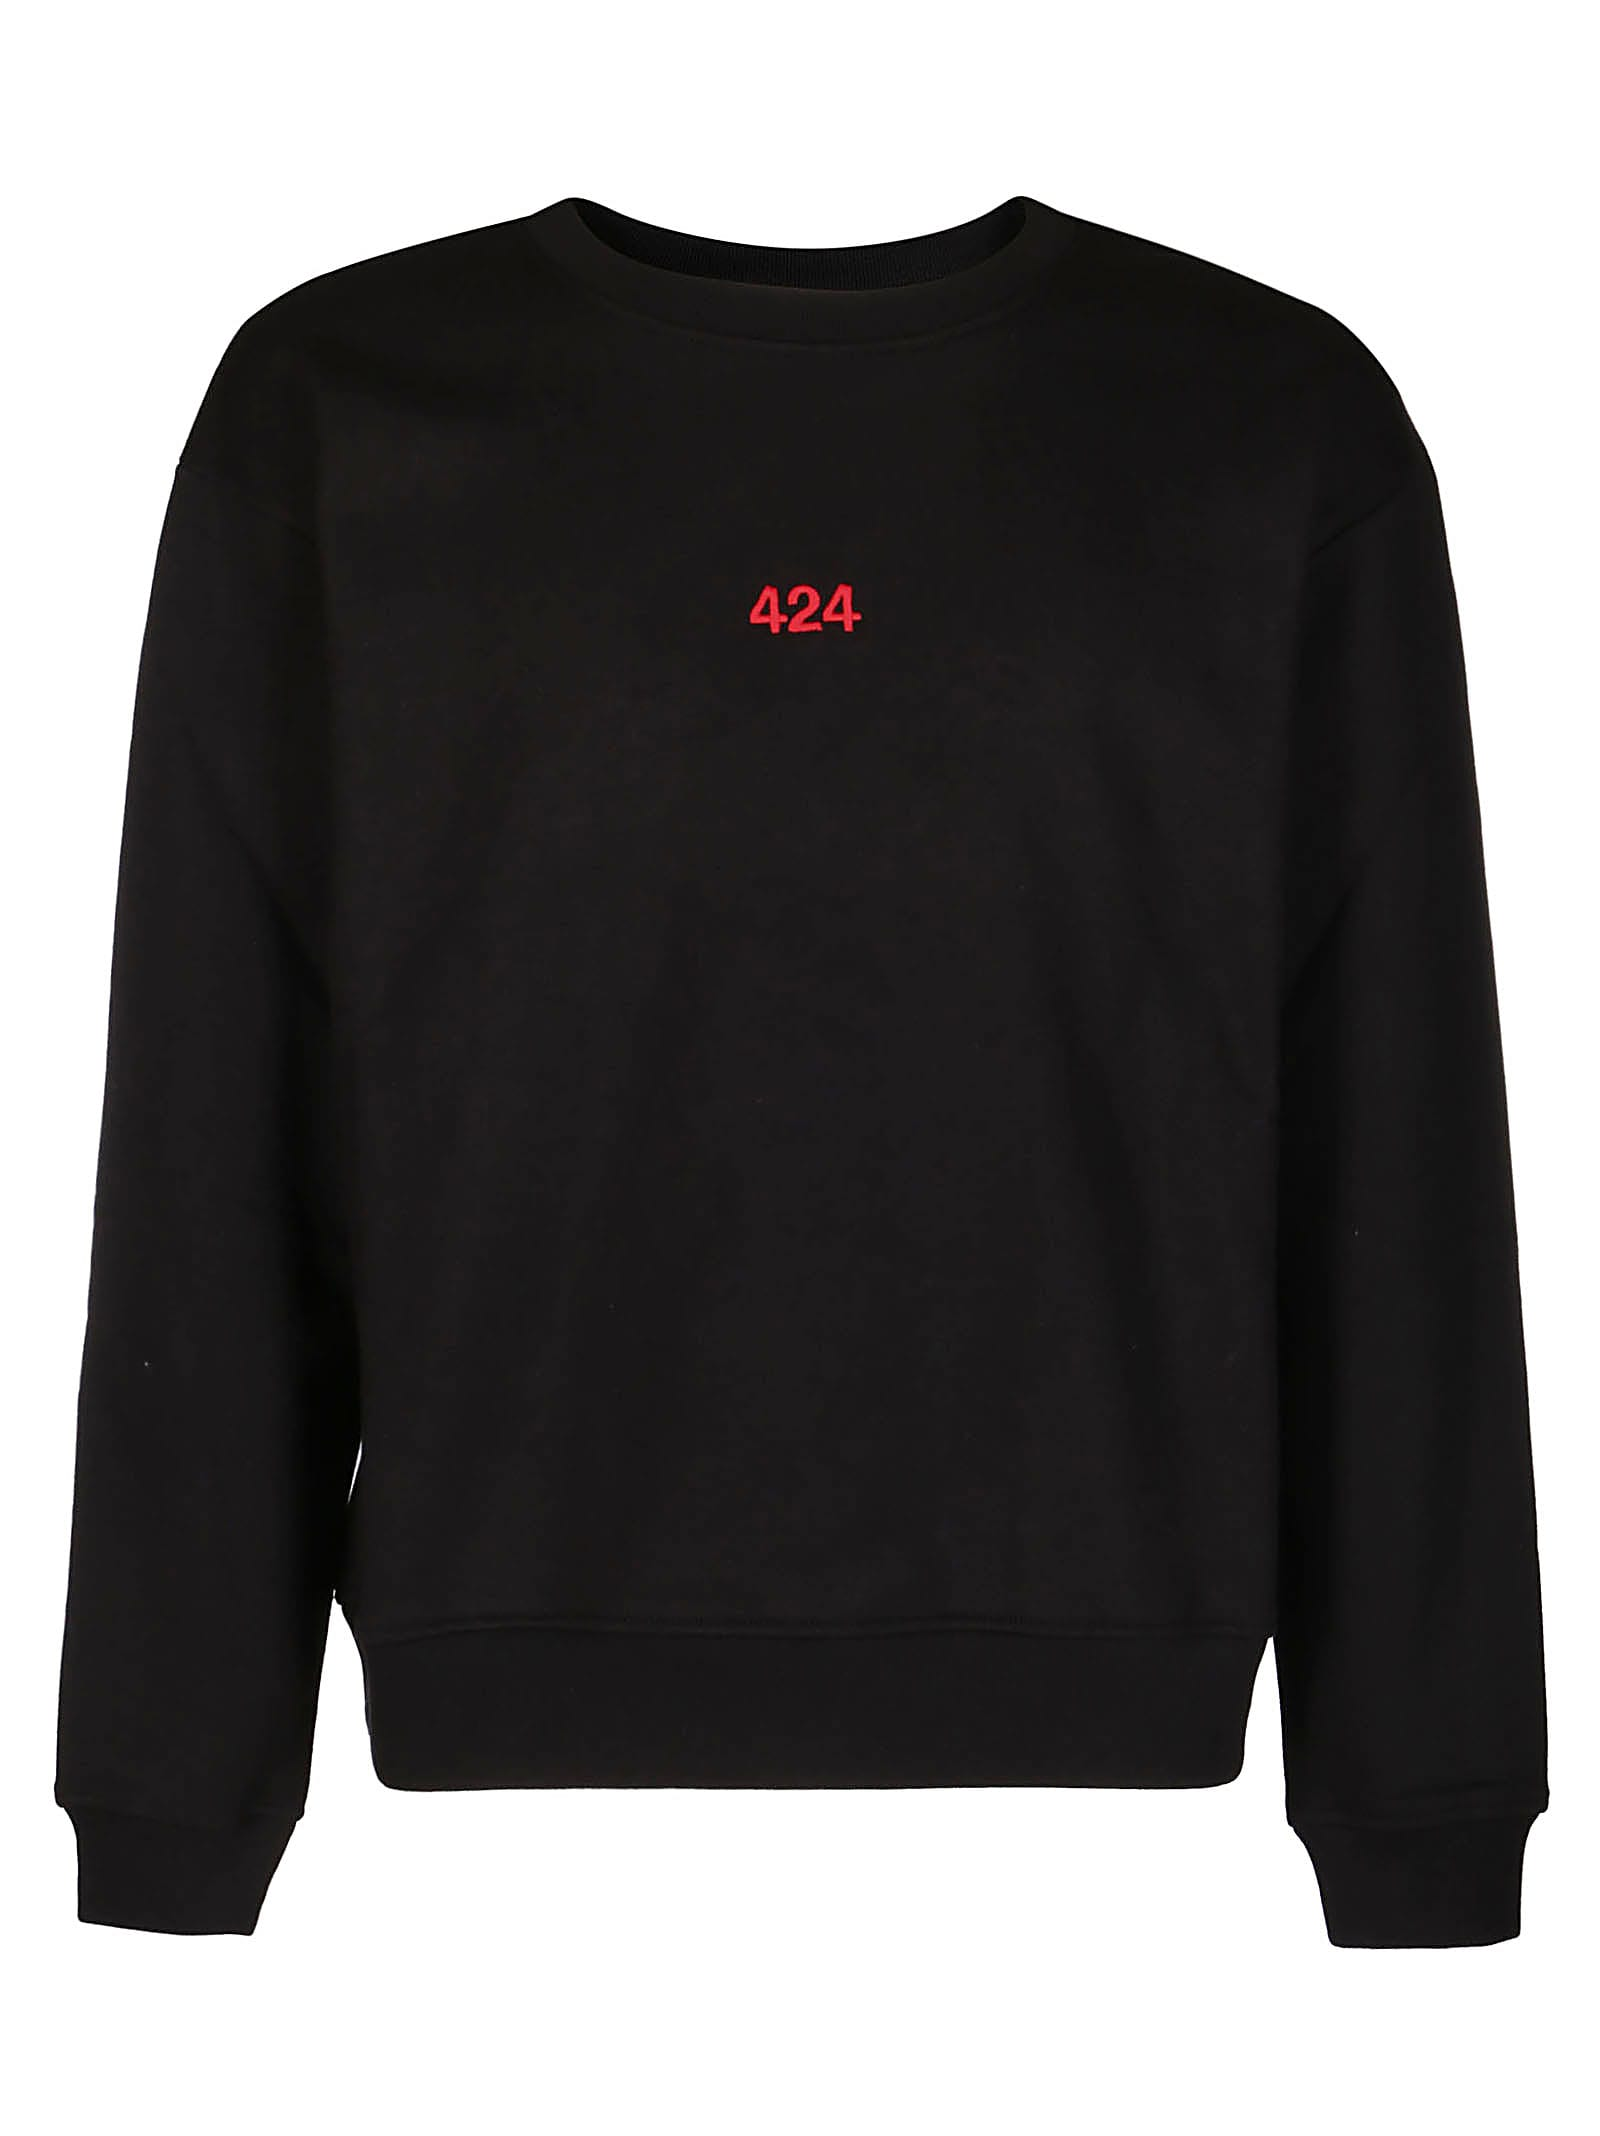 FourTwoFour on Fairfax Black Cotton Sweatshirt